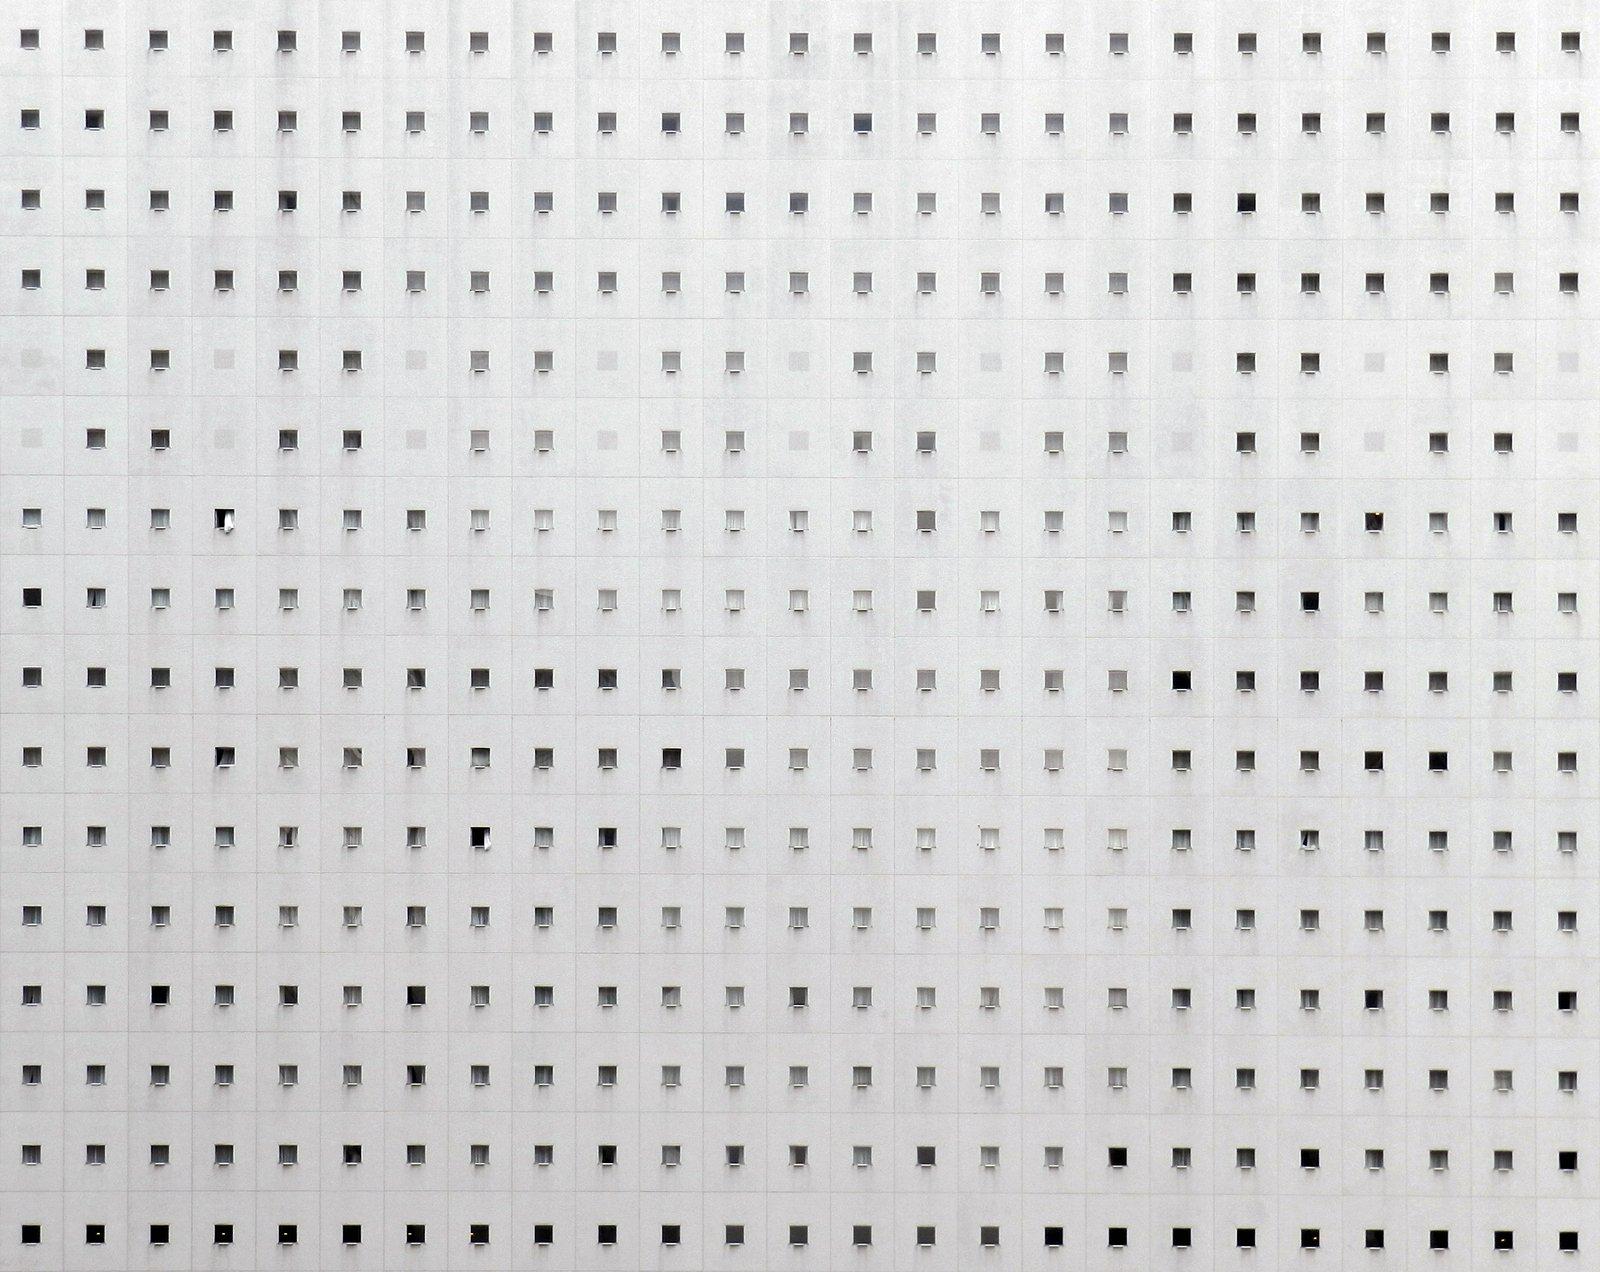 Shredder Building. Says Olic,  Photo 14 of 16 in Nikola Olic's Dizzying Architectural Photography